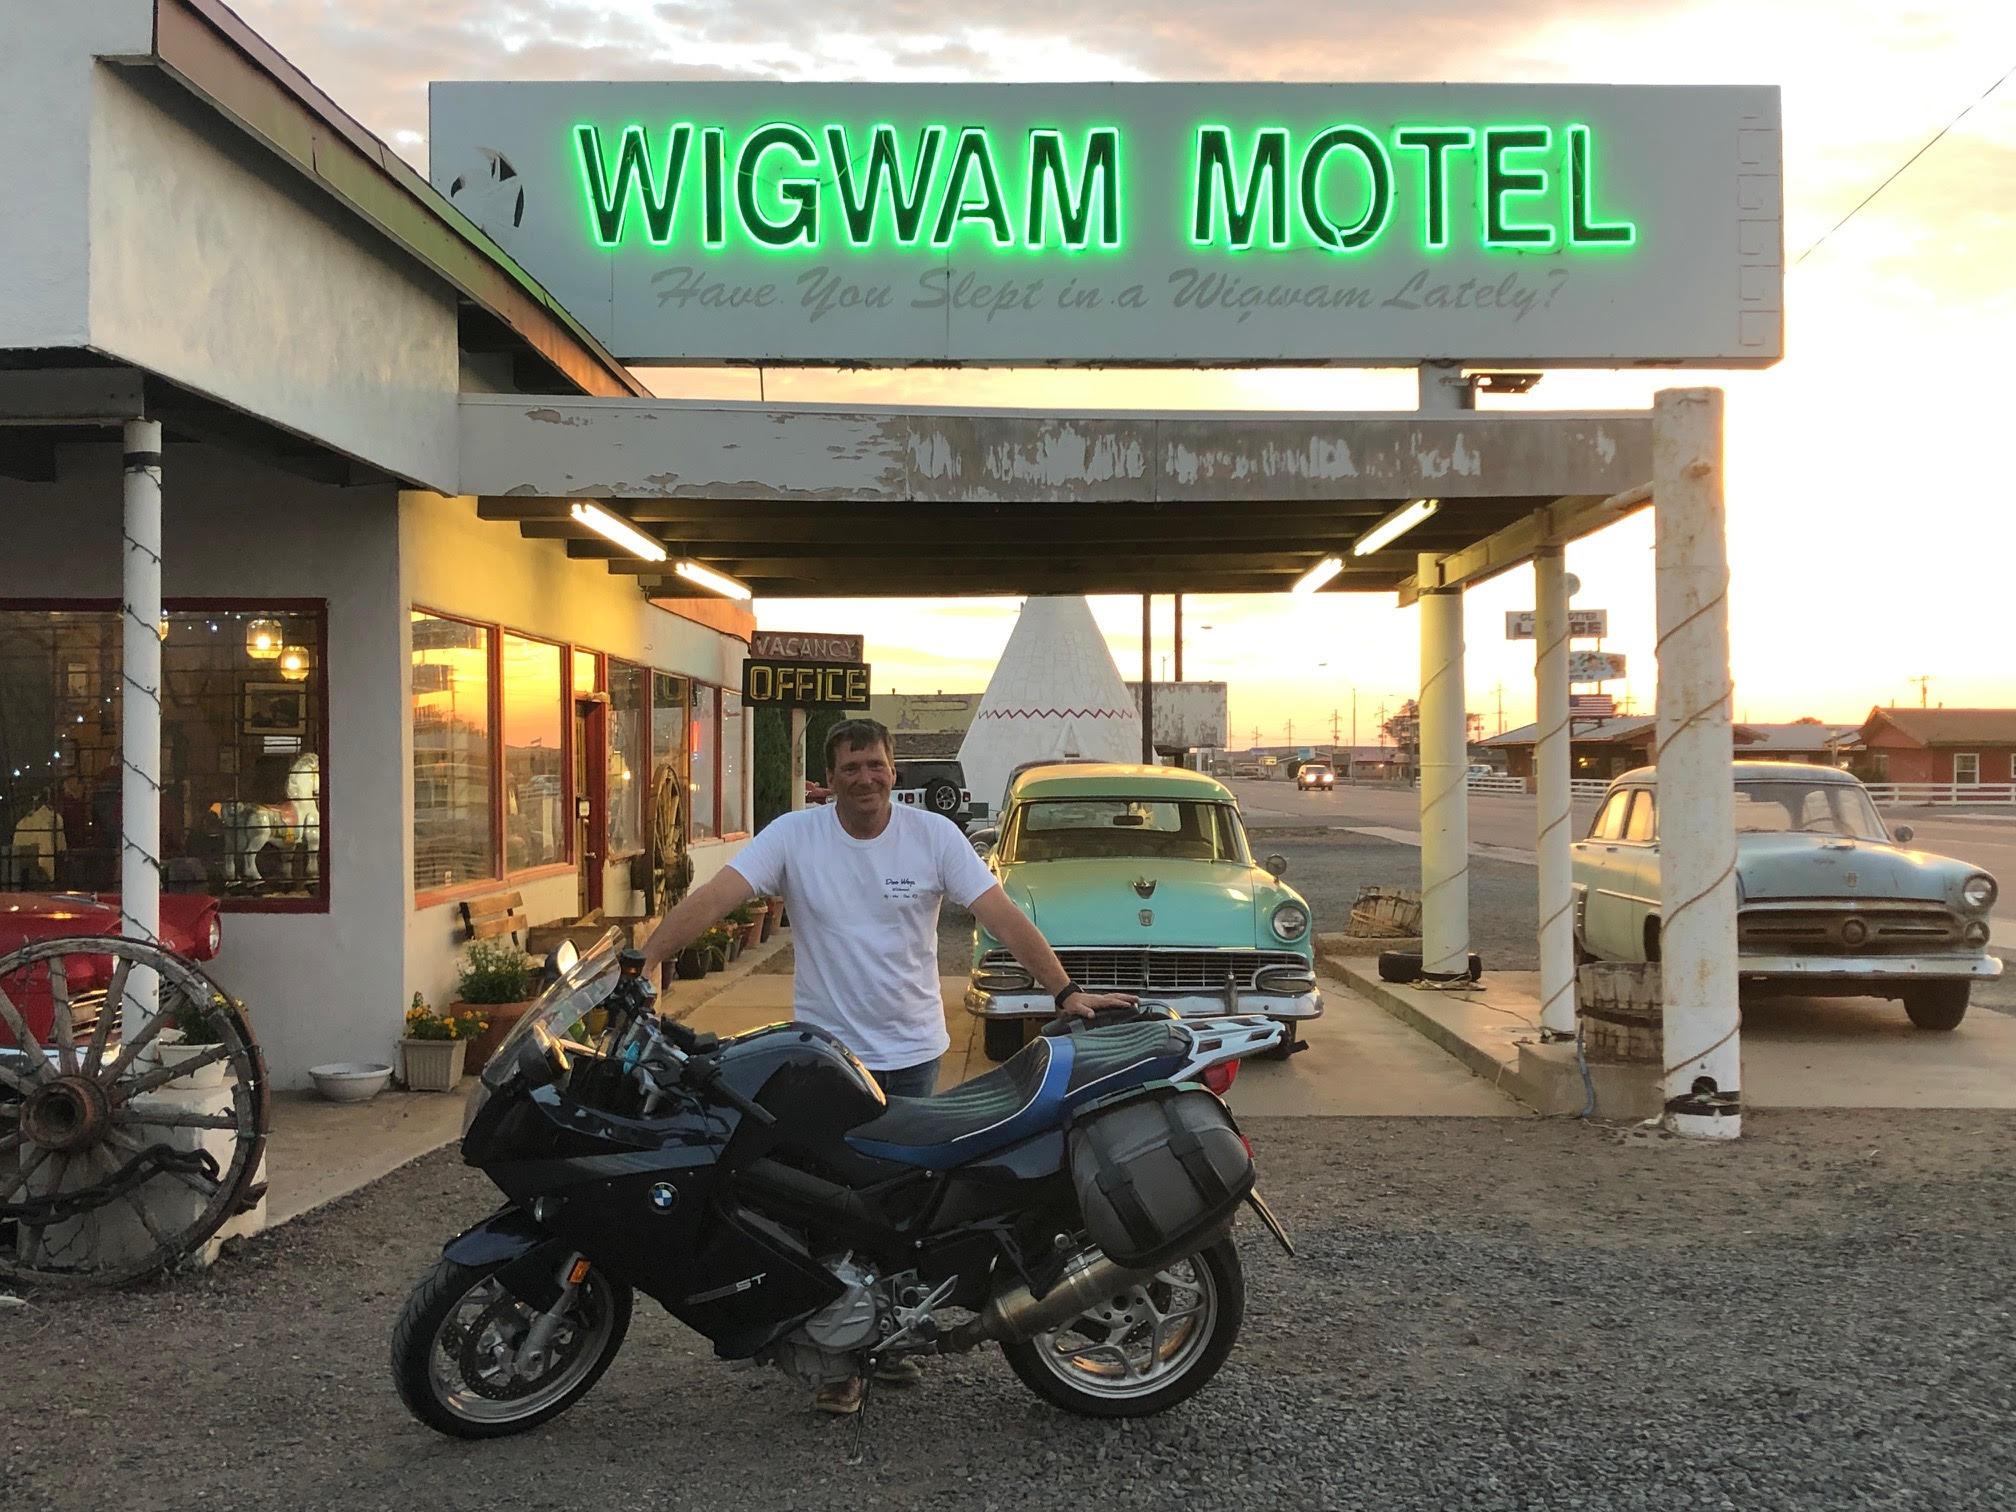 Winwam Motel Holbrook AZ